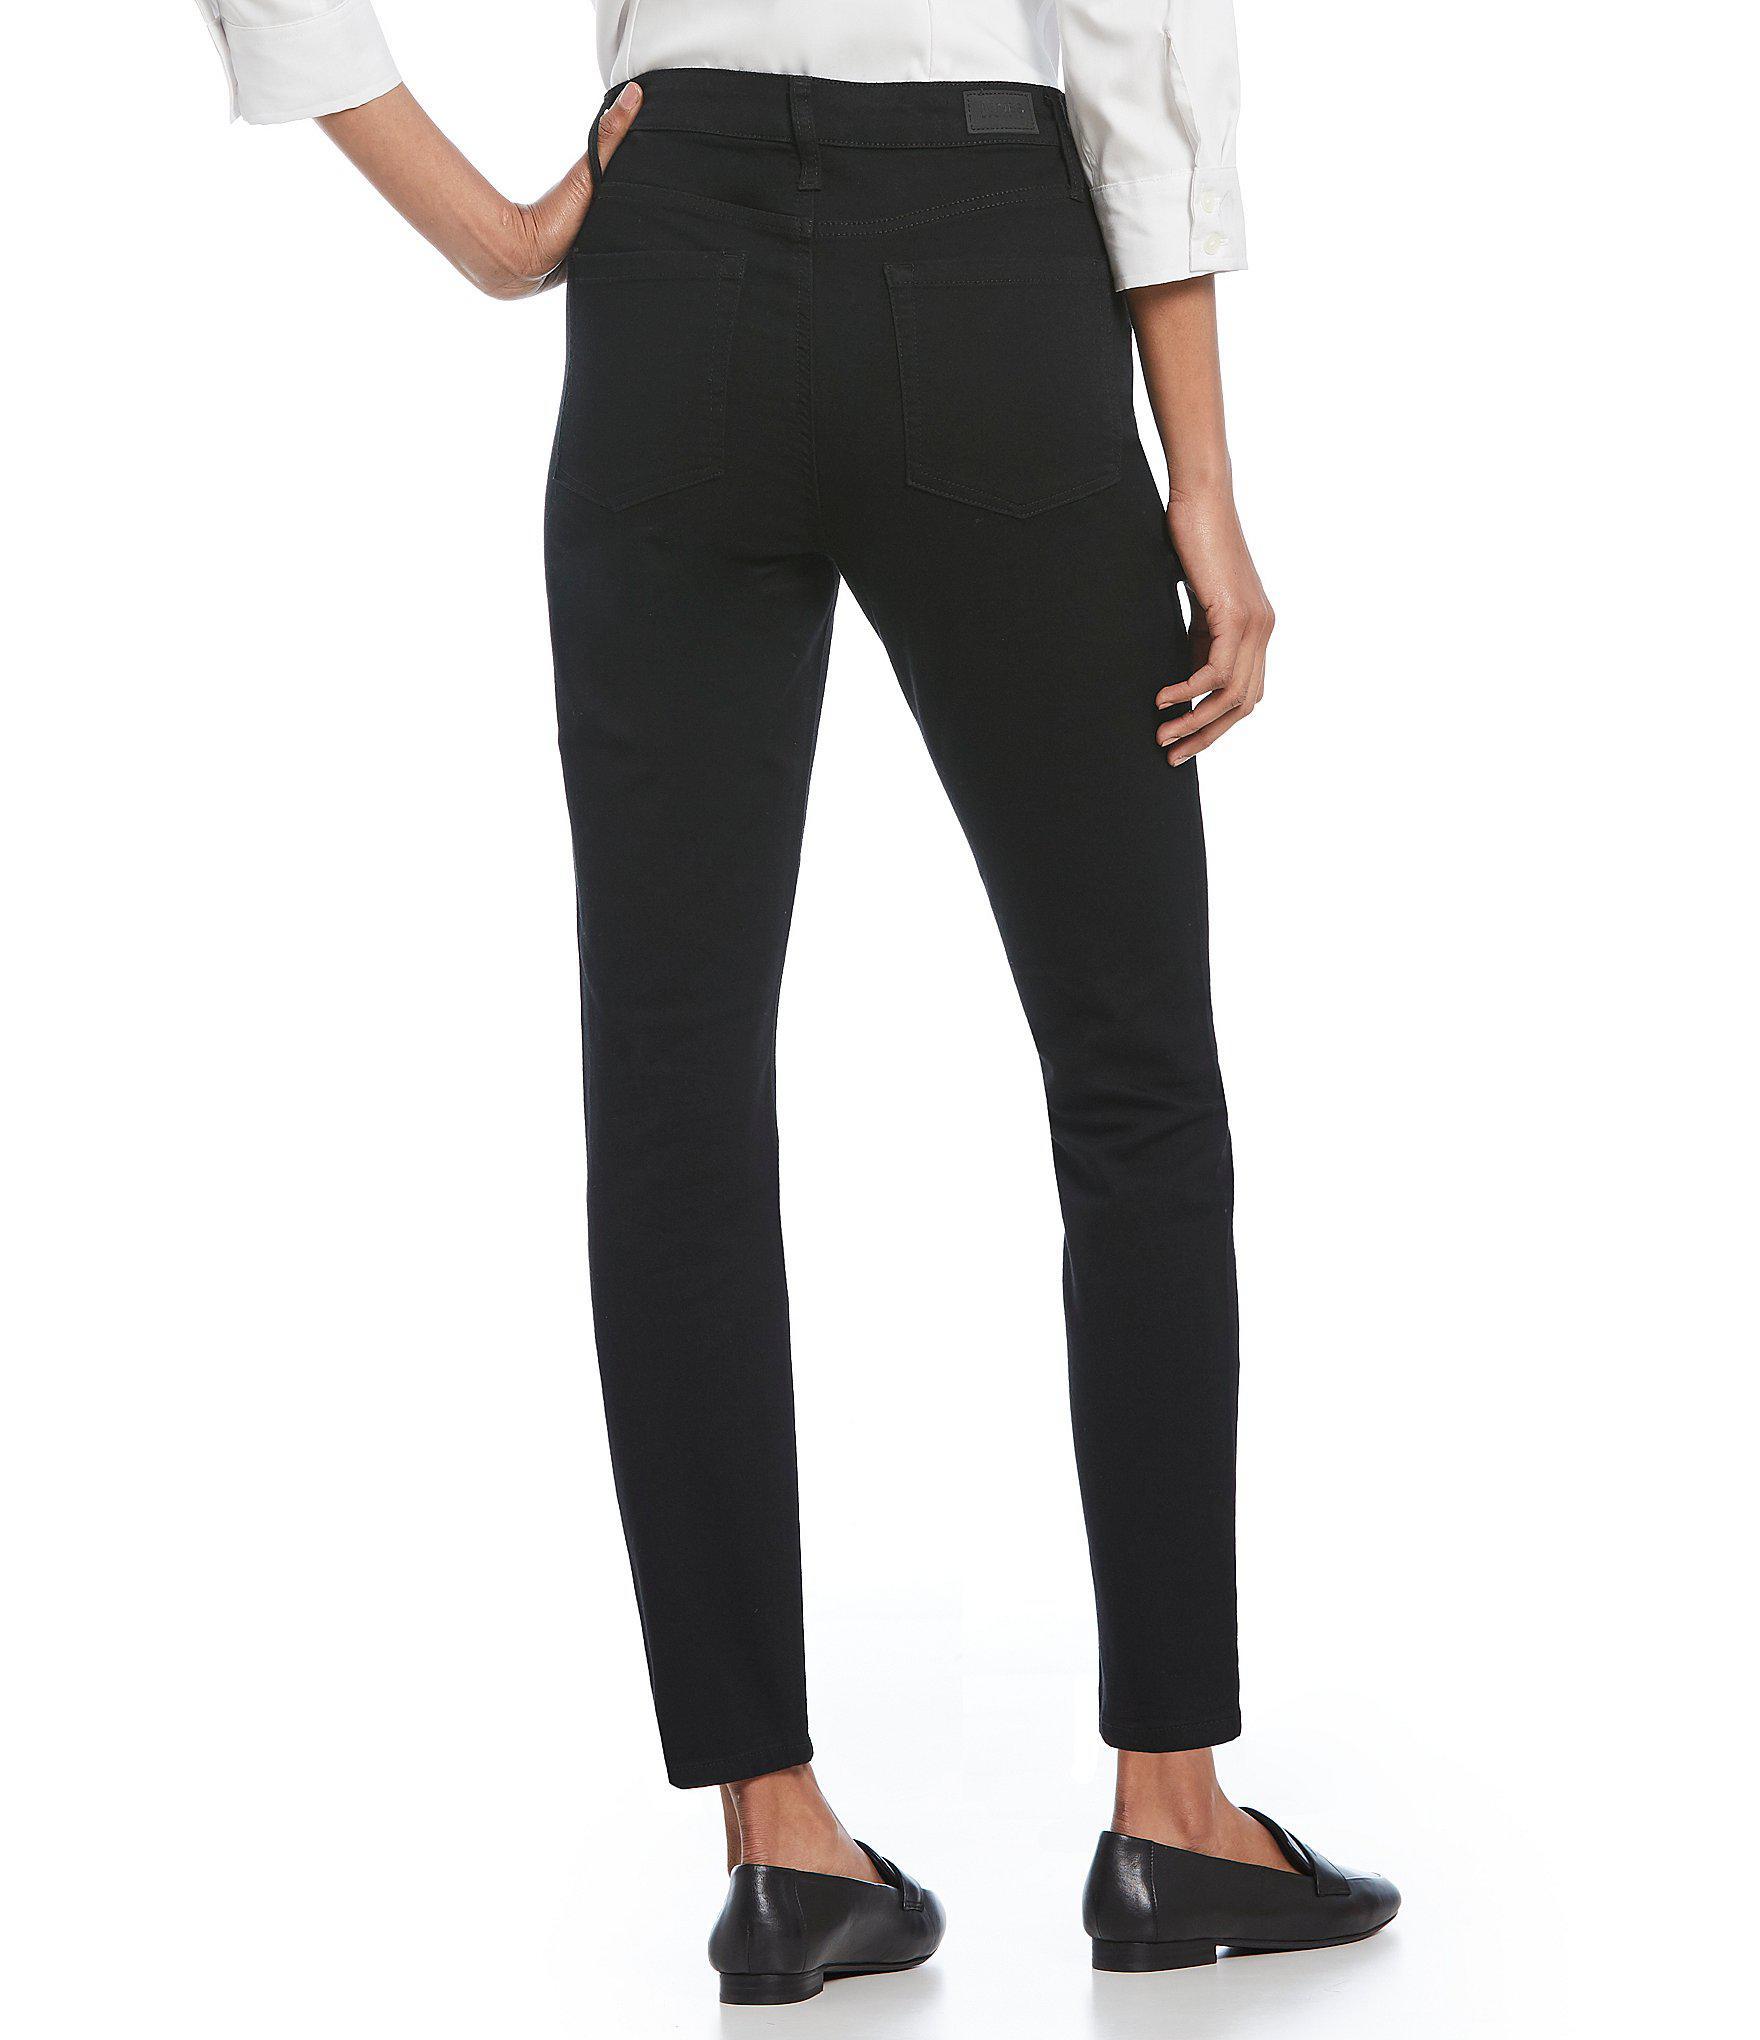 f4c763b0442 Jones New York - Black Lexington Curvy Onyx Wash Stretch Denim Skinny Jeans  - Lyst. View fullscreen